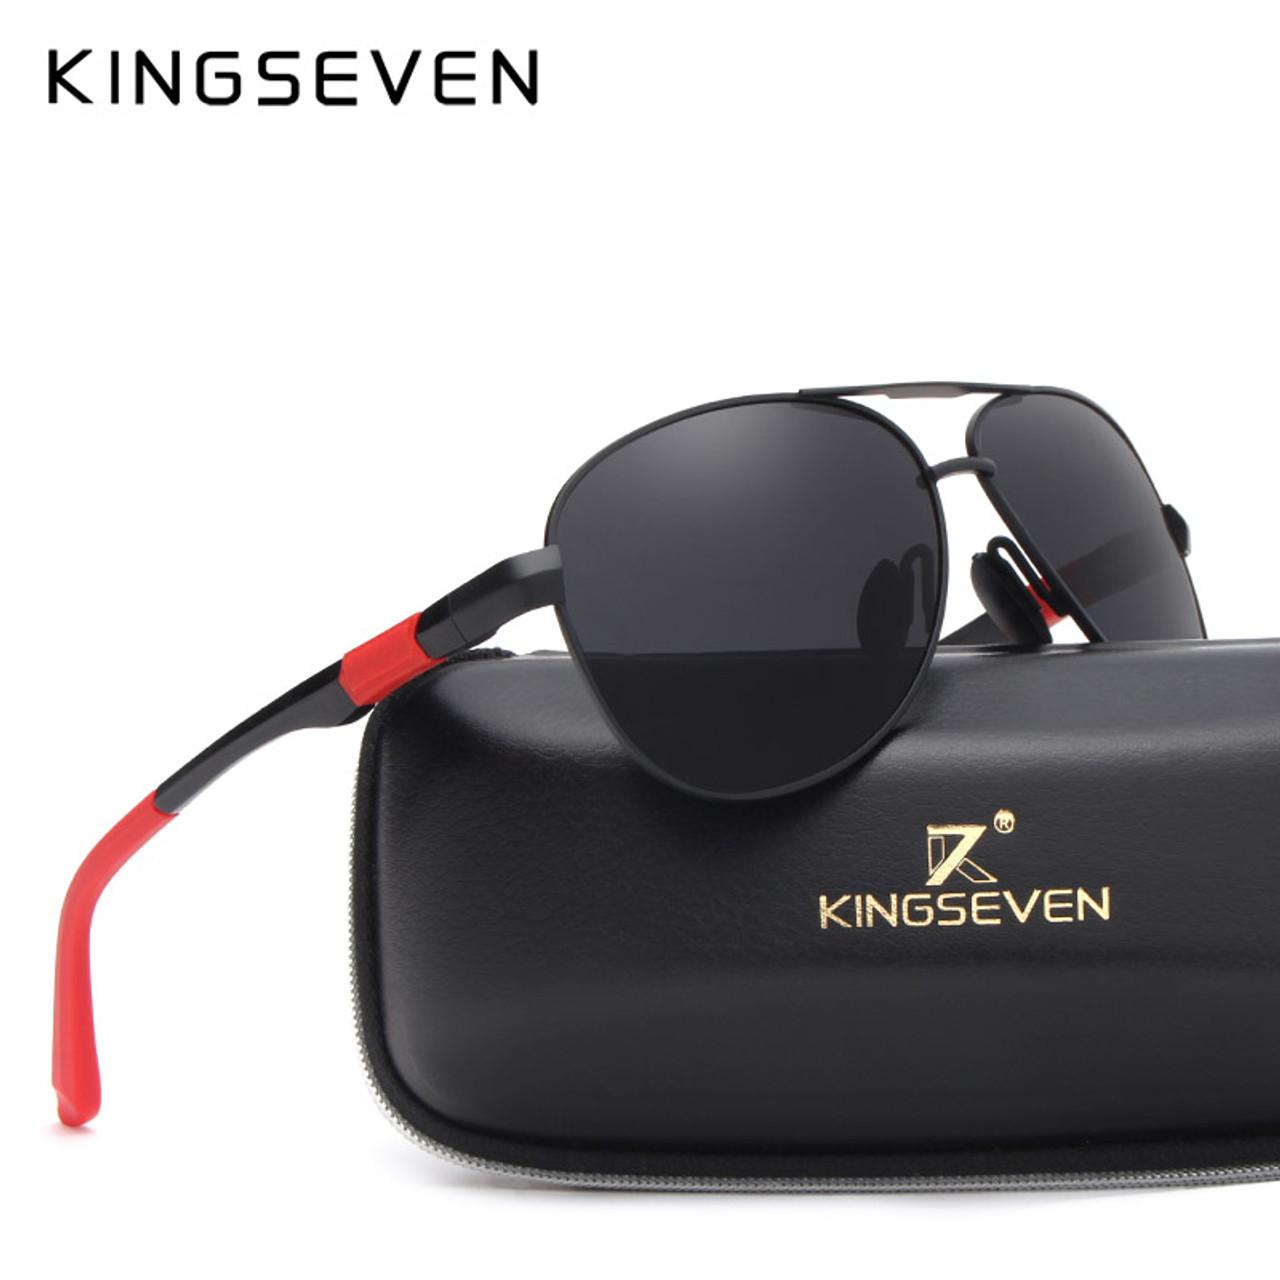 cb3a59e0c63f2 KINGSEVEN Metal Polarized Sunglasses Driving Men Women Brand Designer  Glasses Fashion Eyewear 100% UV Protection ...